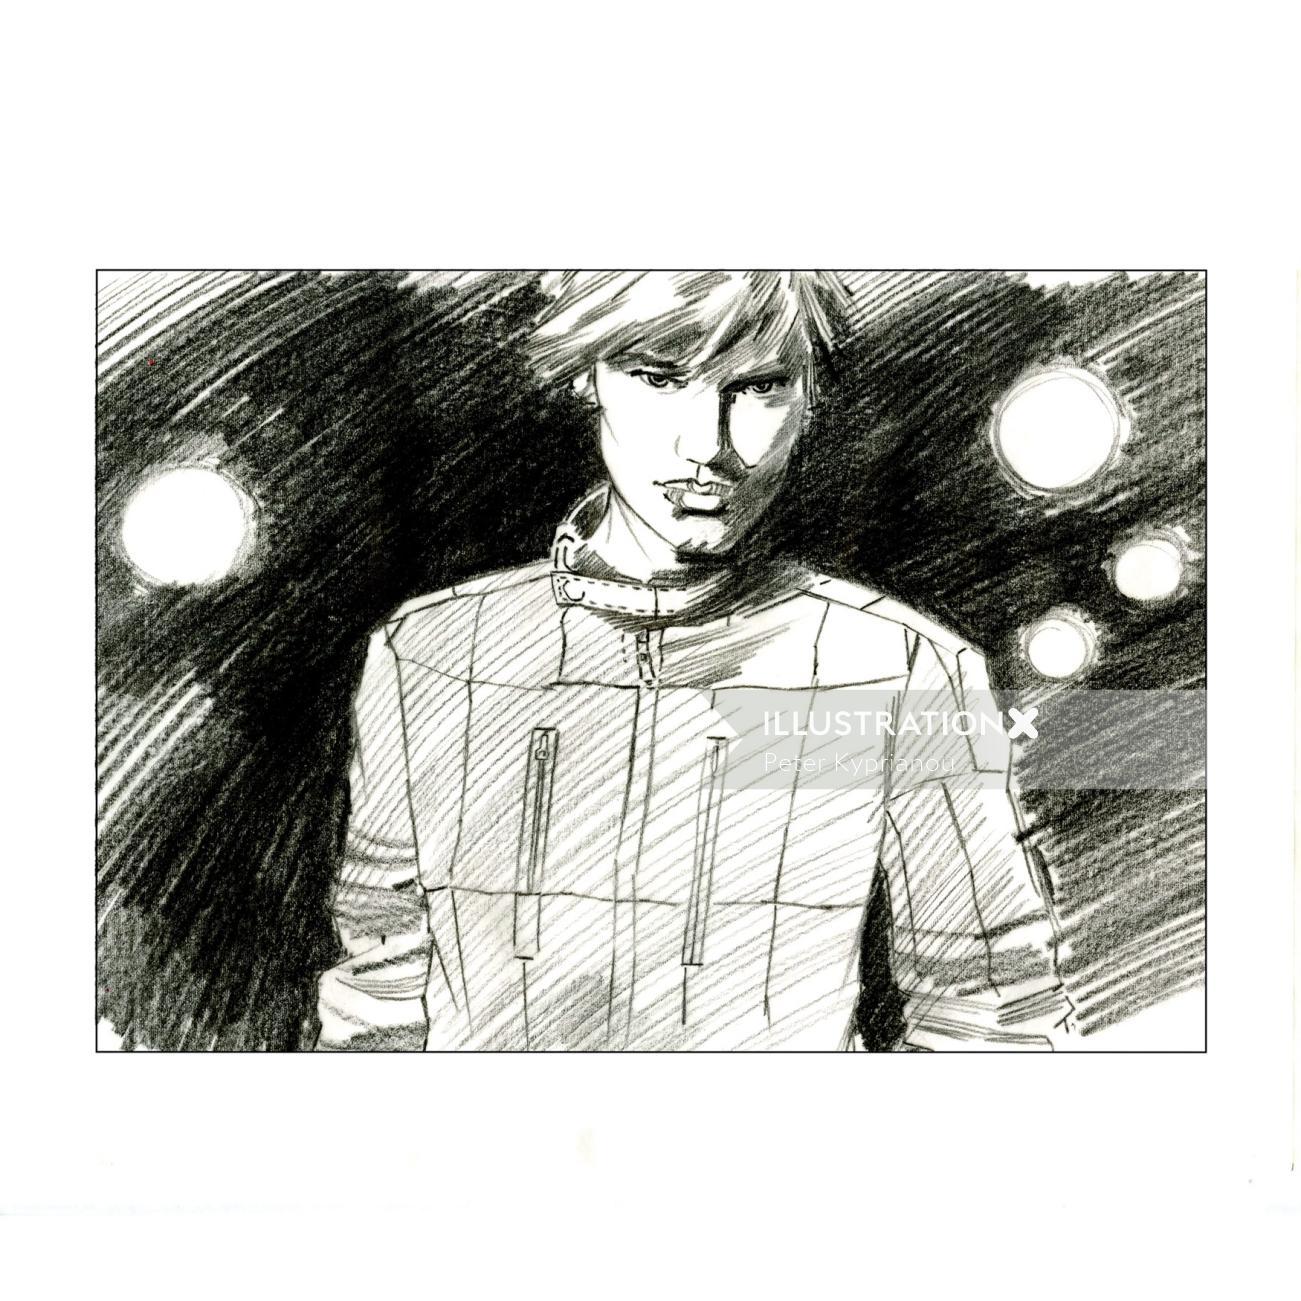 Pencil art of Male fashion model